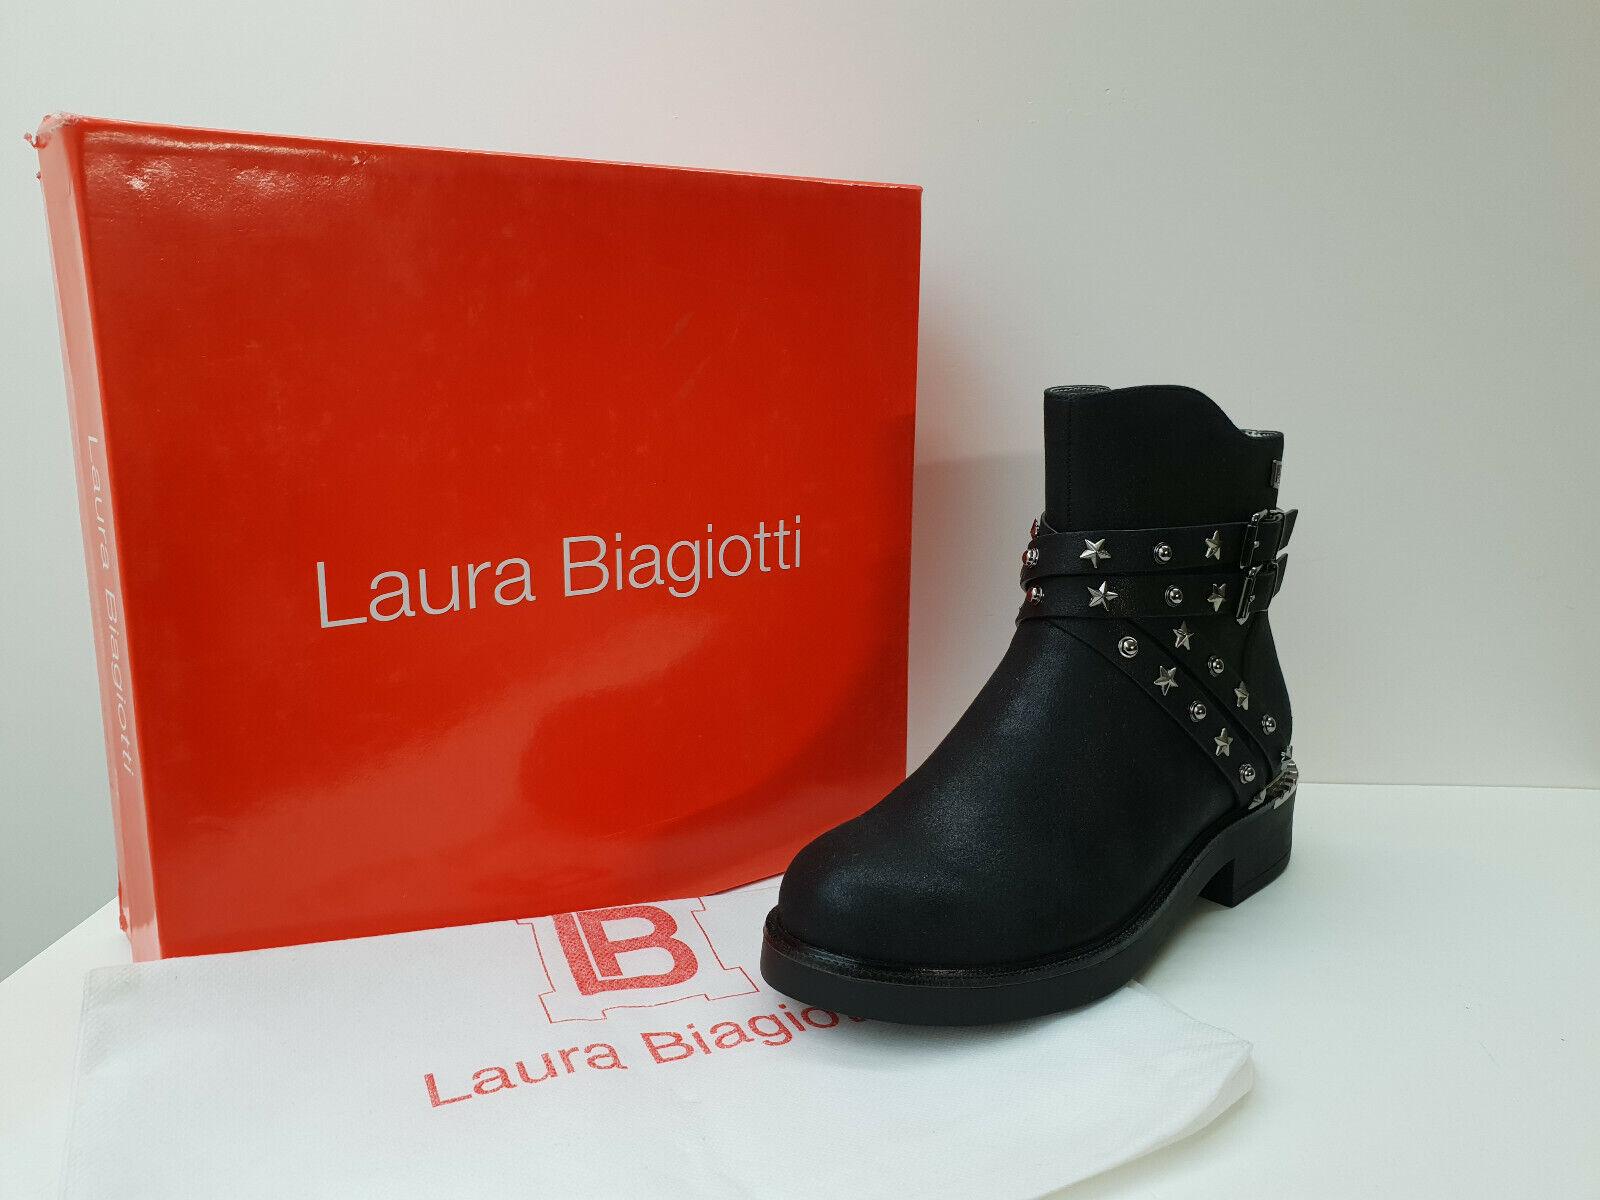 Zapatos De Mujer Laura Laura Laura Biagiotti Descuento - 50 % Art. 2022 - 22 - Col. negro def66a